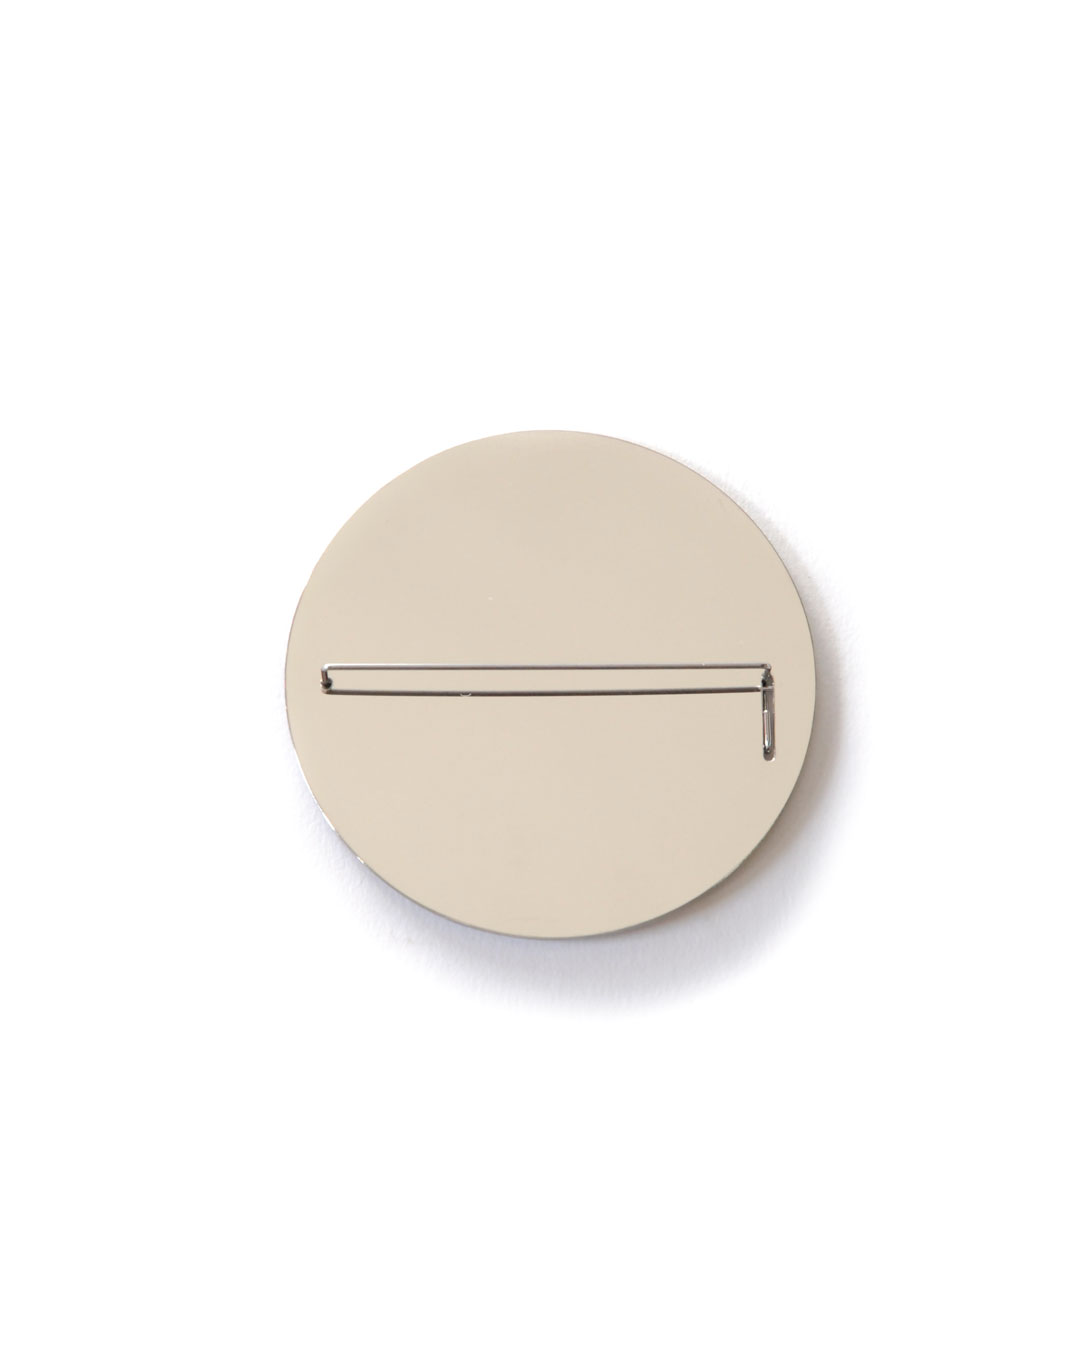 Junwon Jung, Pin and Mirror, 2015, brooch; steel, 65 x 65 mm, €610